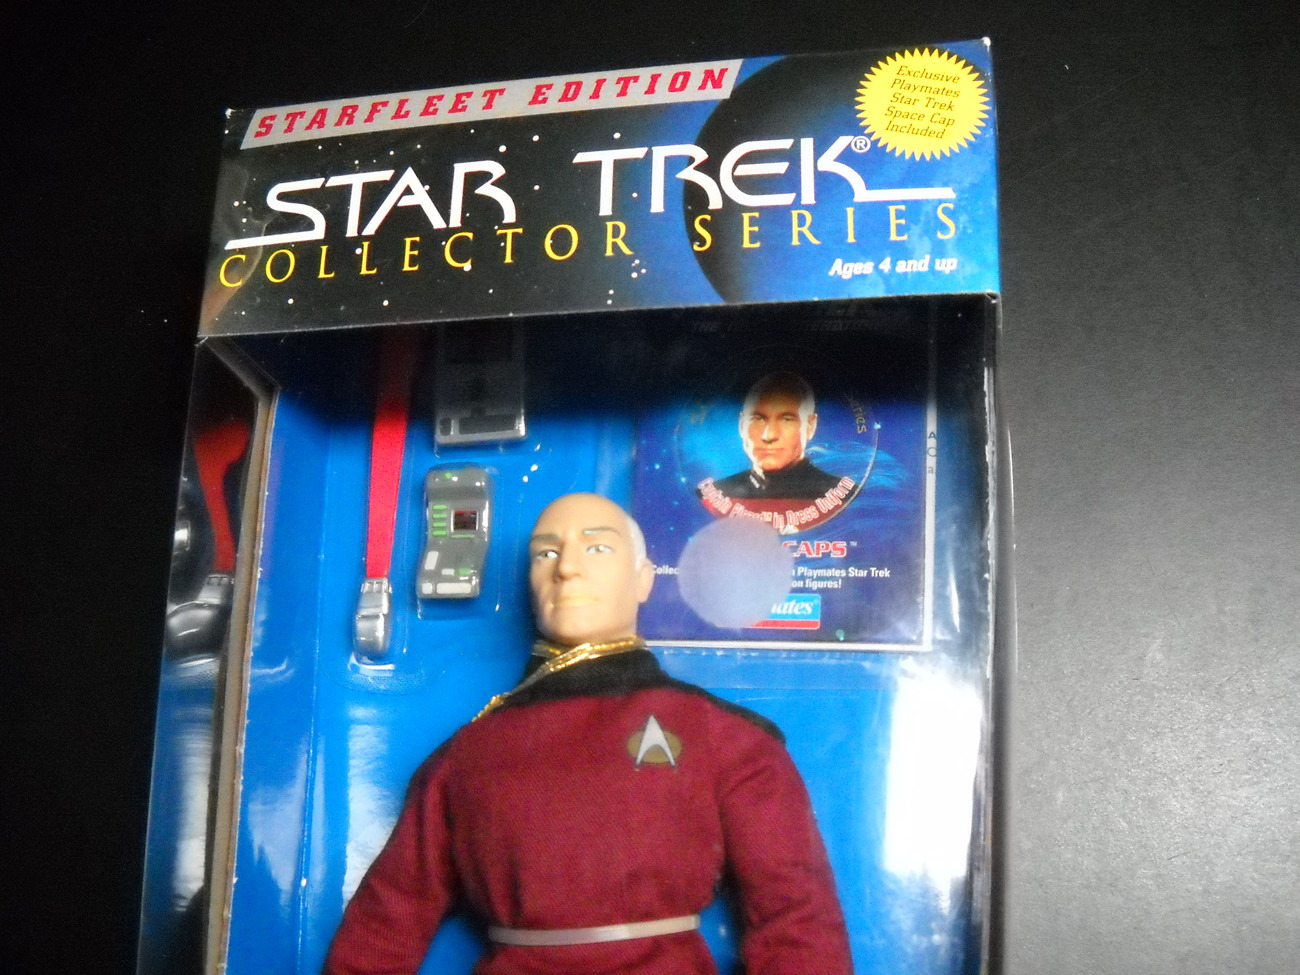 Star Trek Collector Series Starfleet Edition Picard in Dress Uniform 1995 Sealed